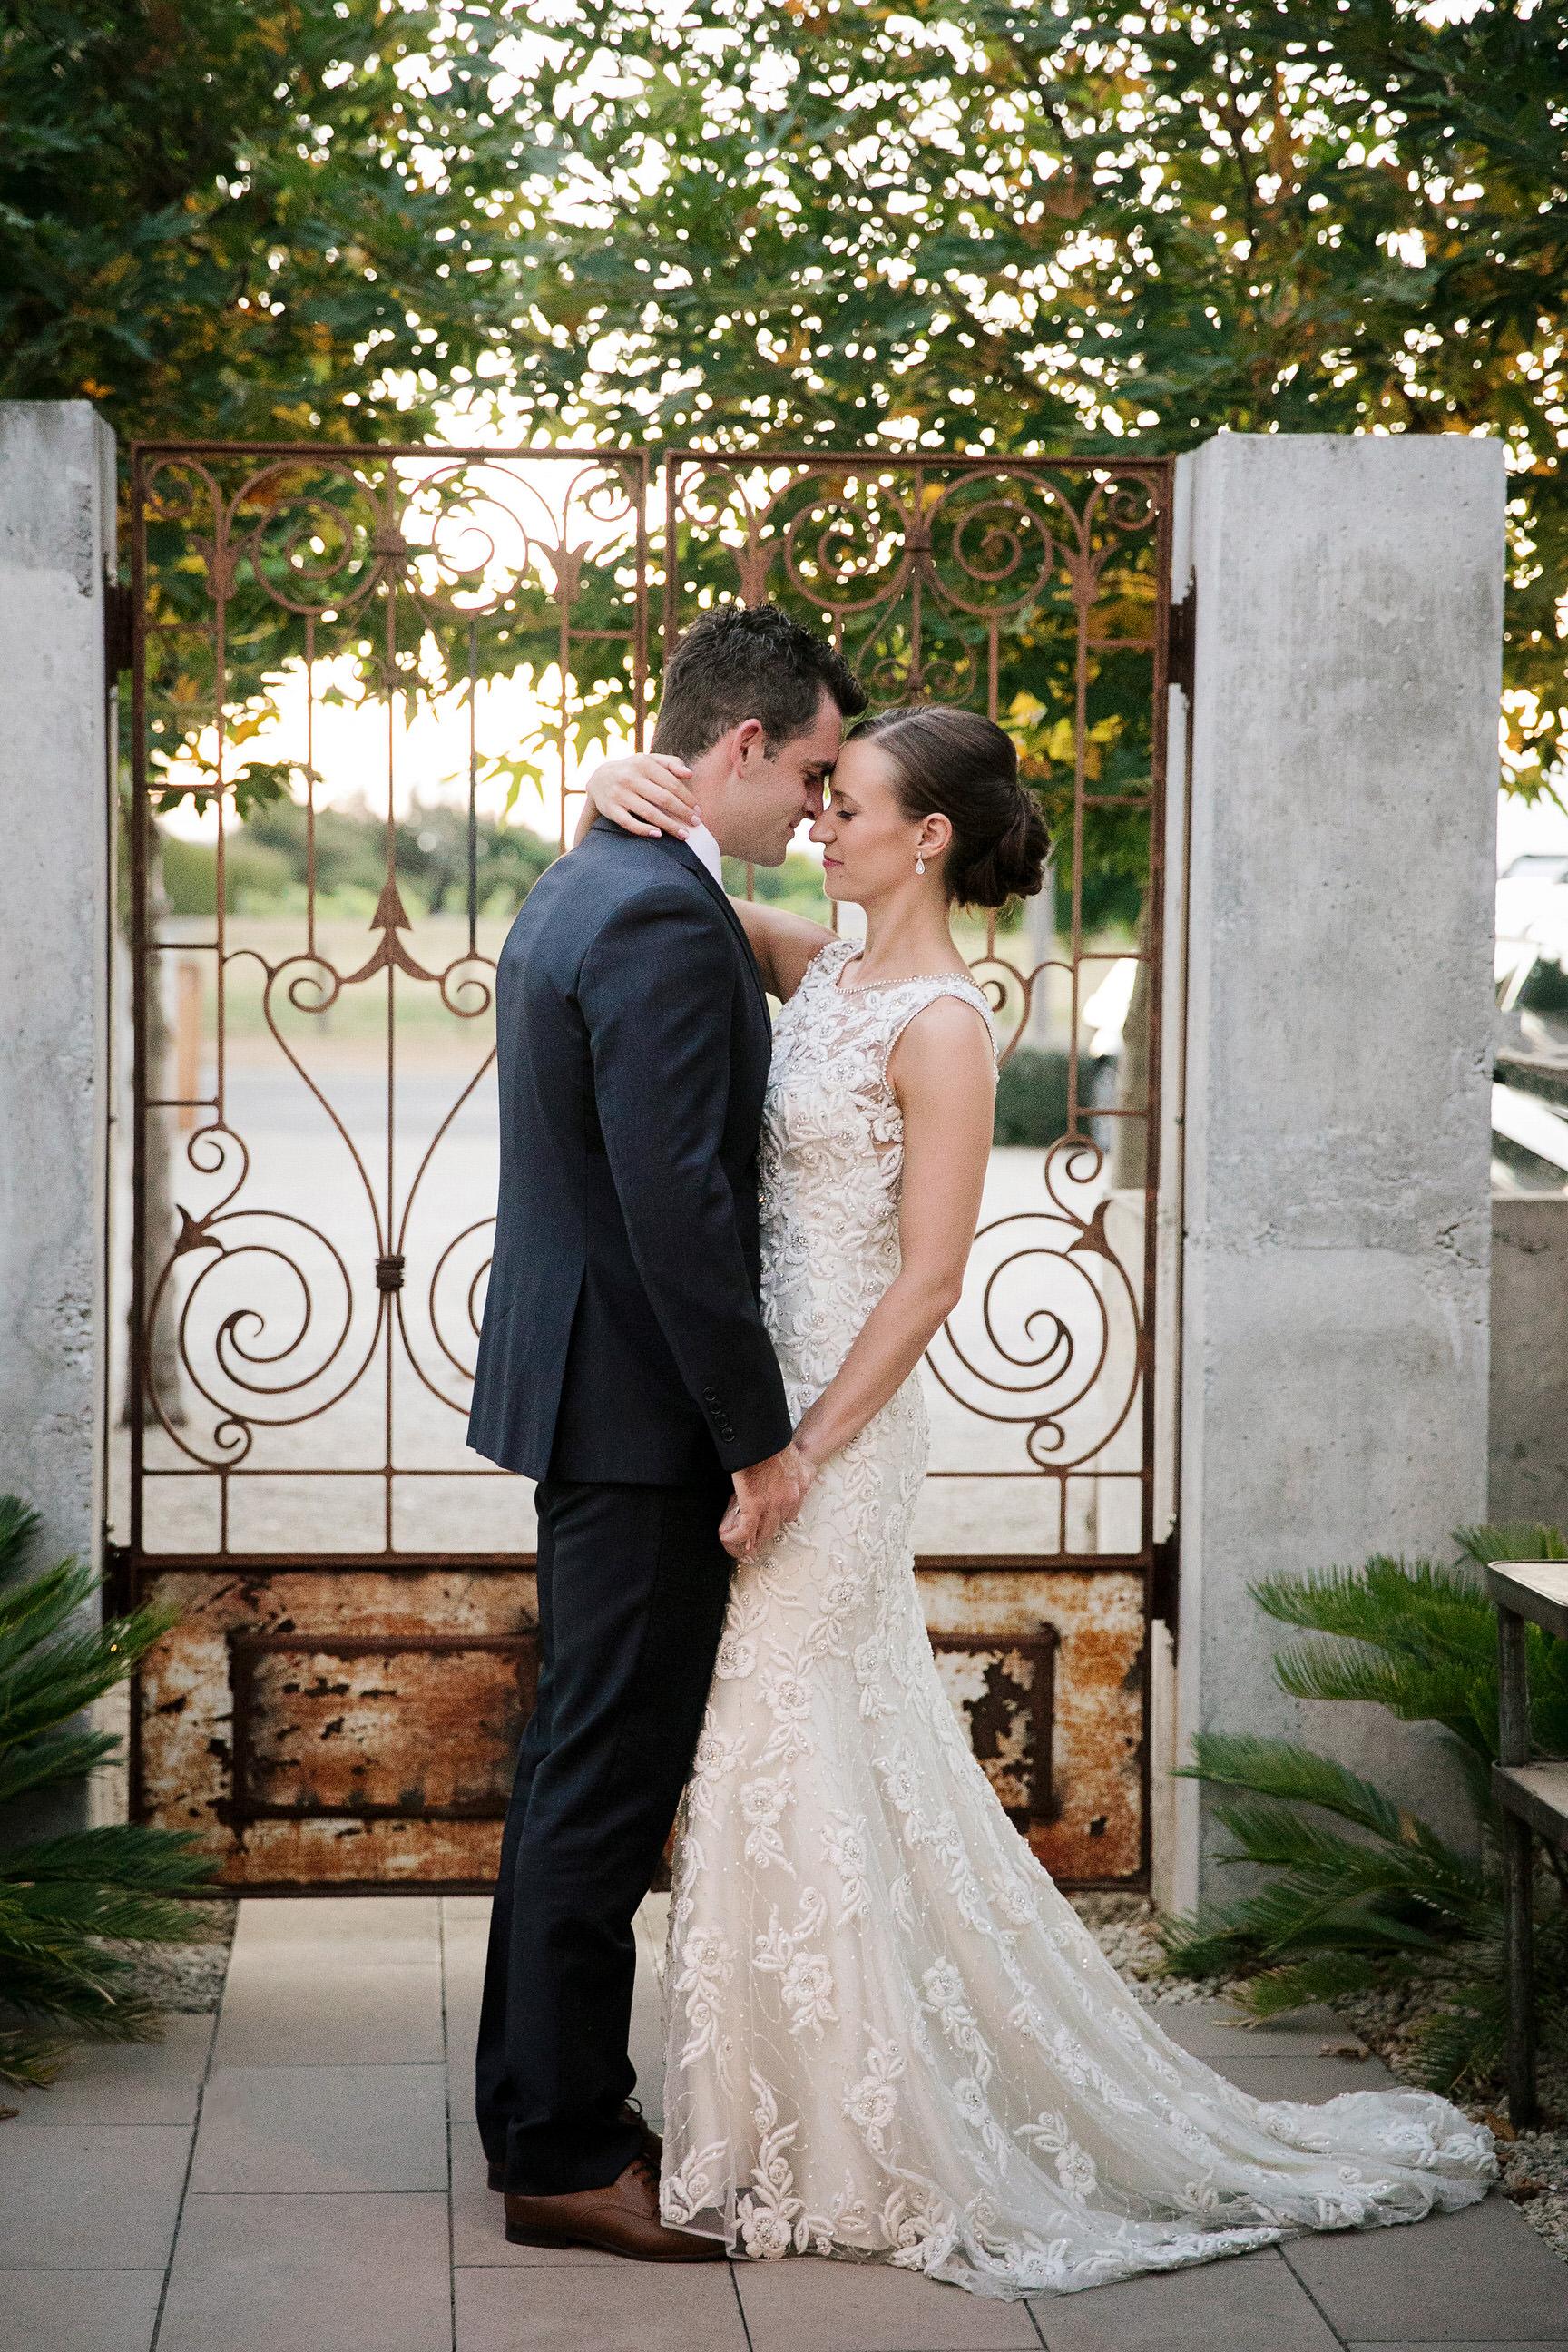 Martinborough-Poppies-Wedding-Caine-Eloise-Toni-Larsen-0120.jpg